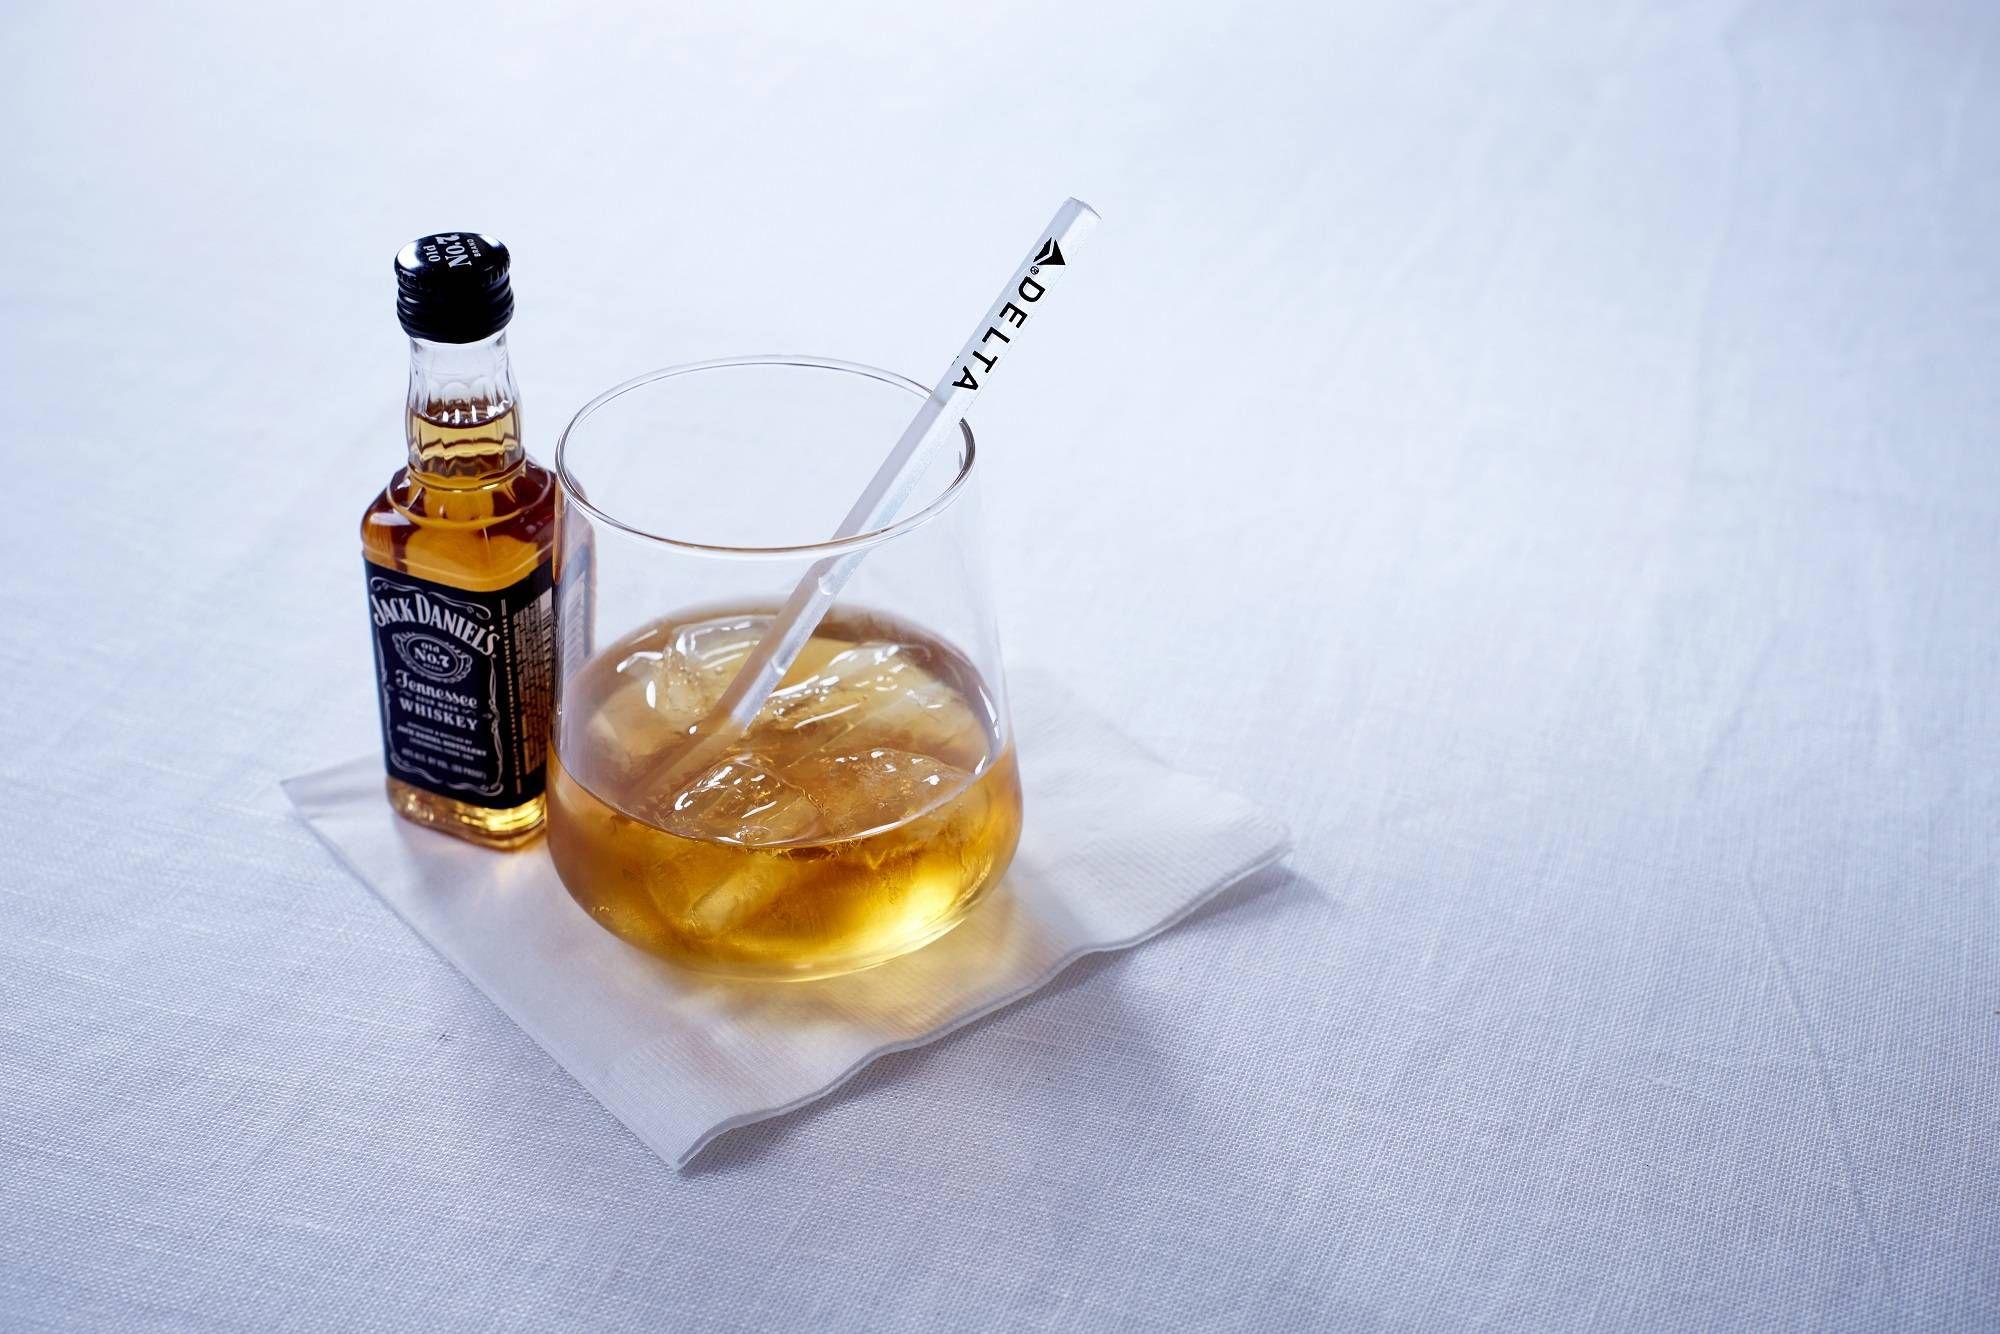 Delta terá novos drinks à bordo para comemorar os 150 anos da Jack Daniel's